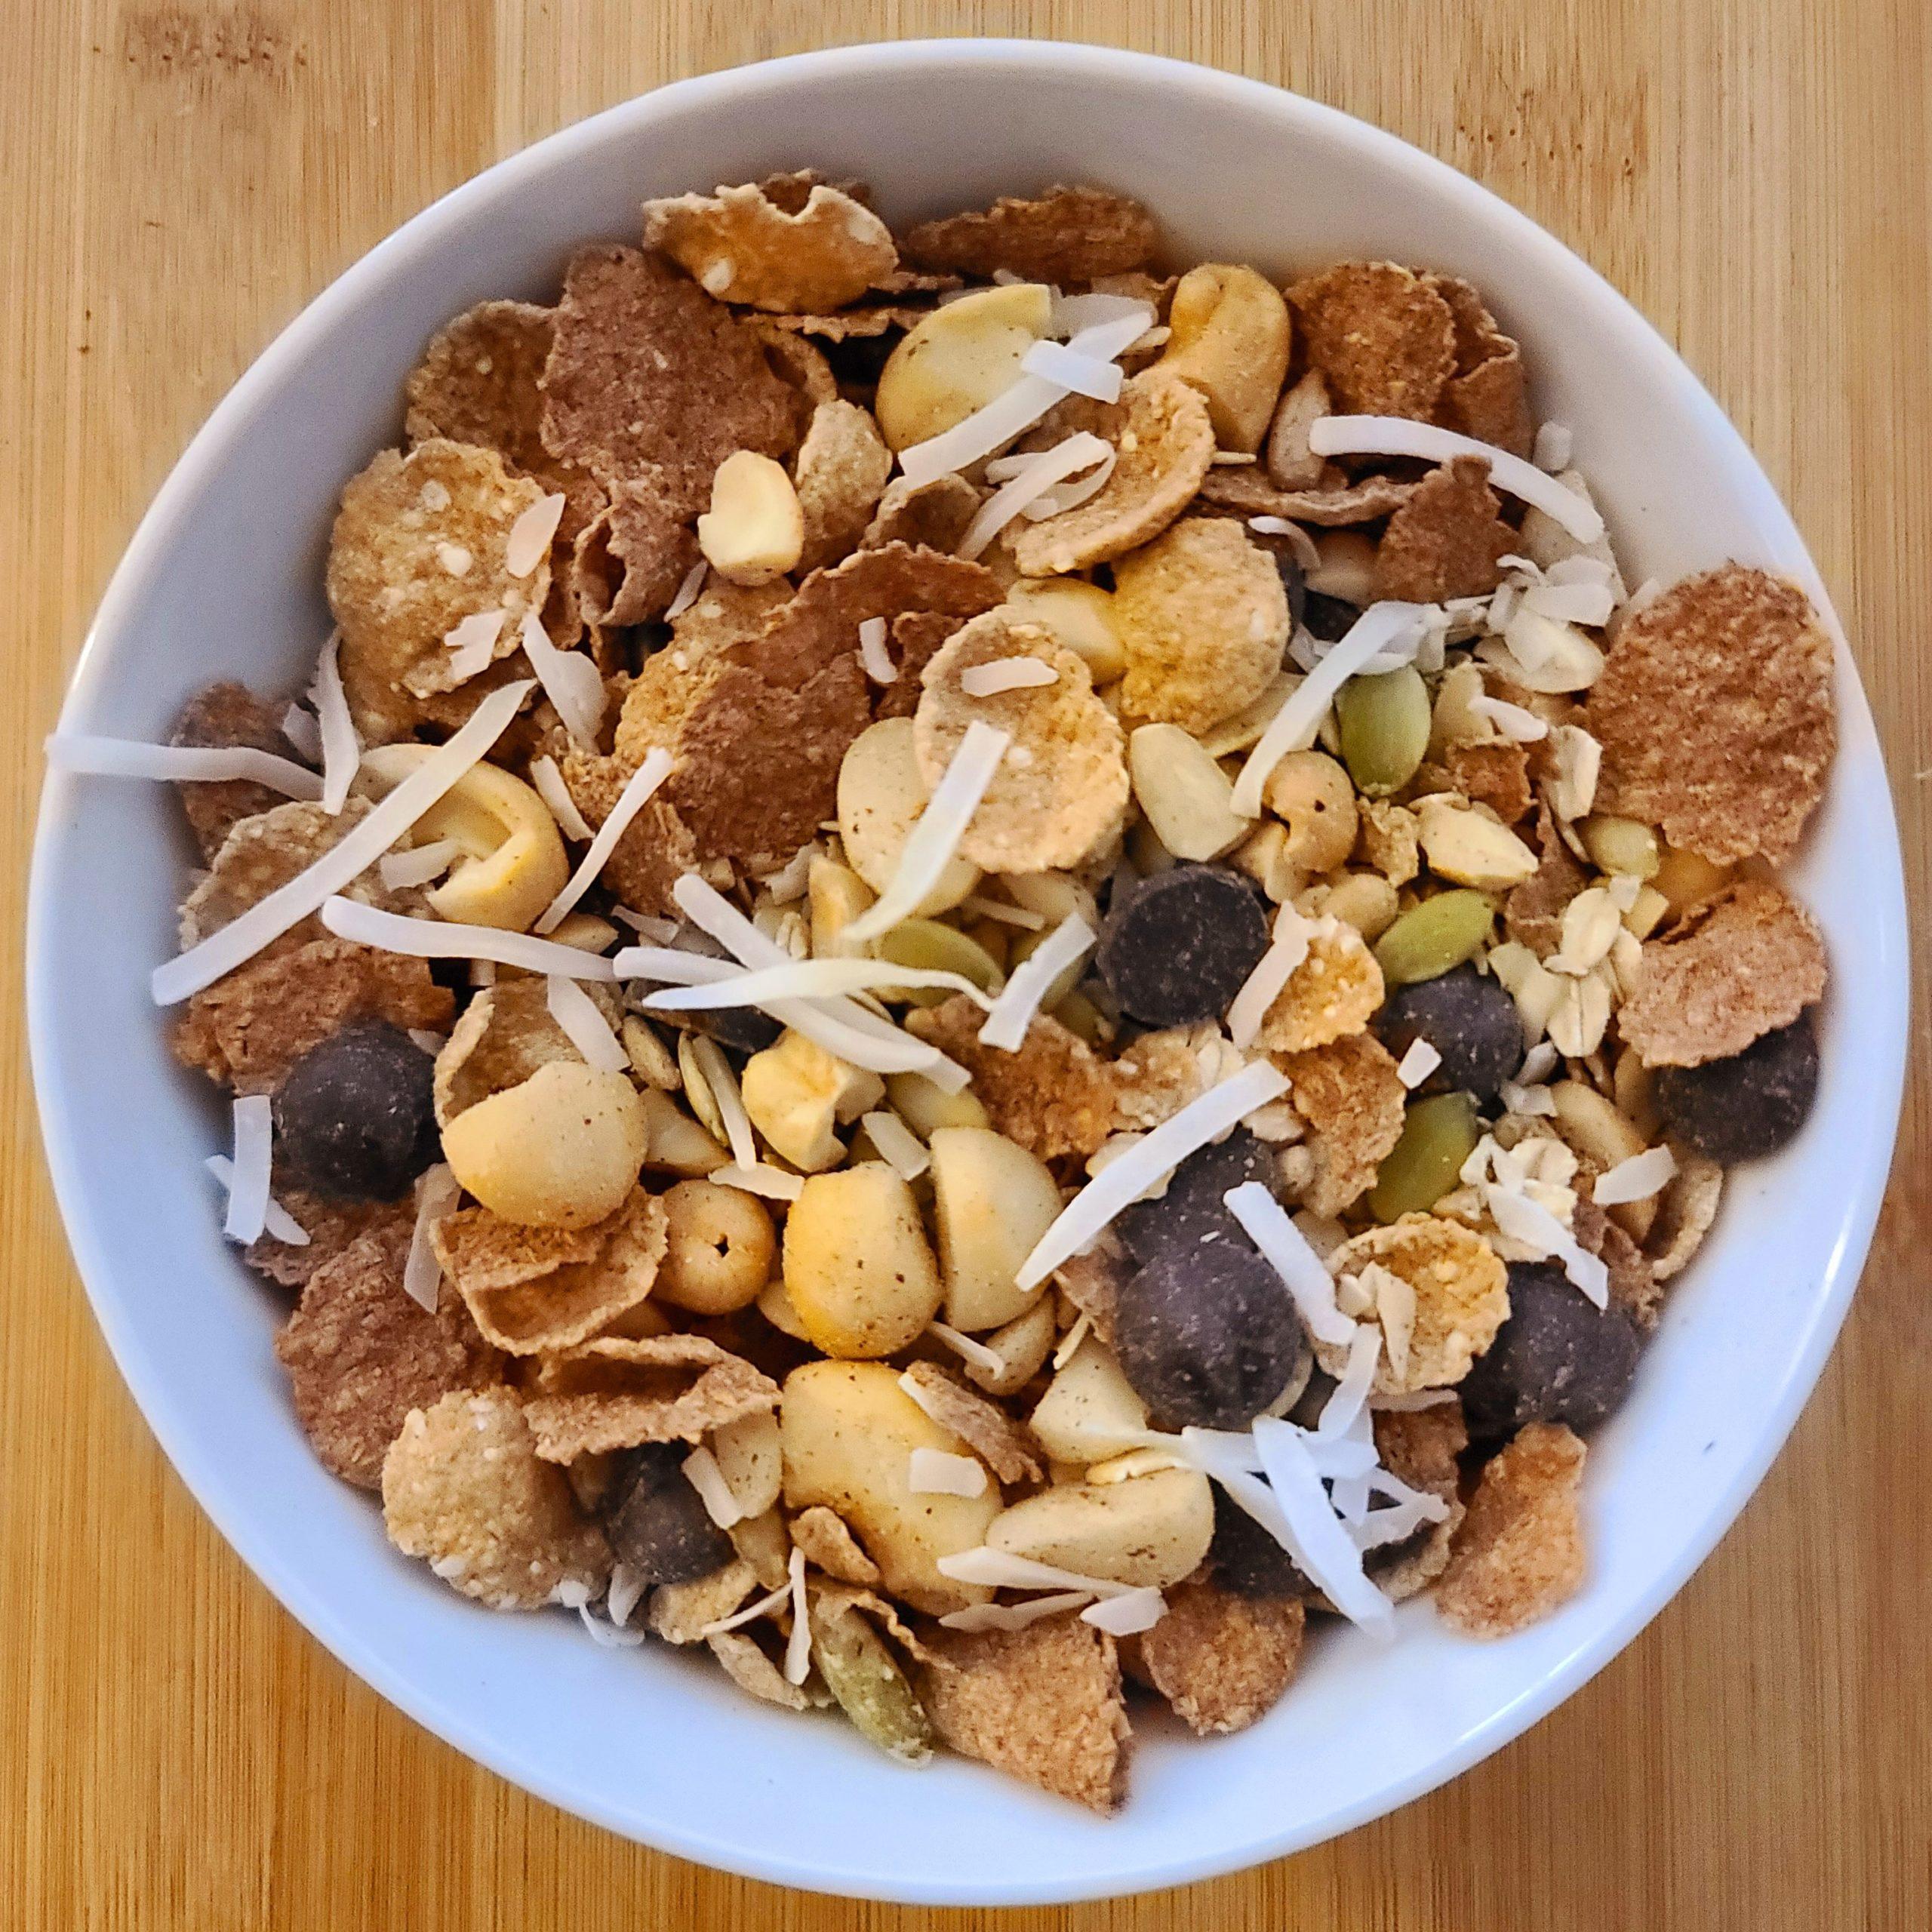 Crunchy Crazy Good Cereal (2)